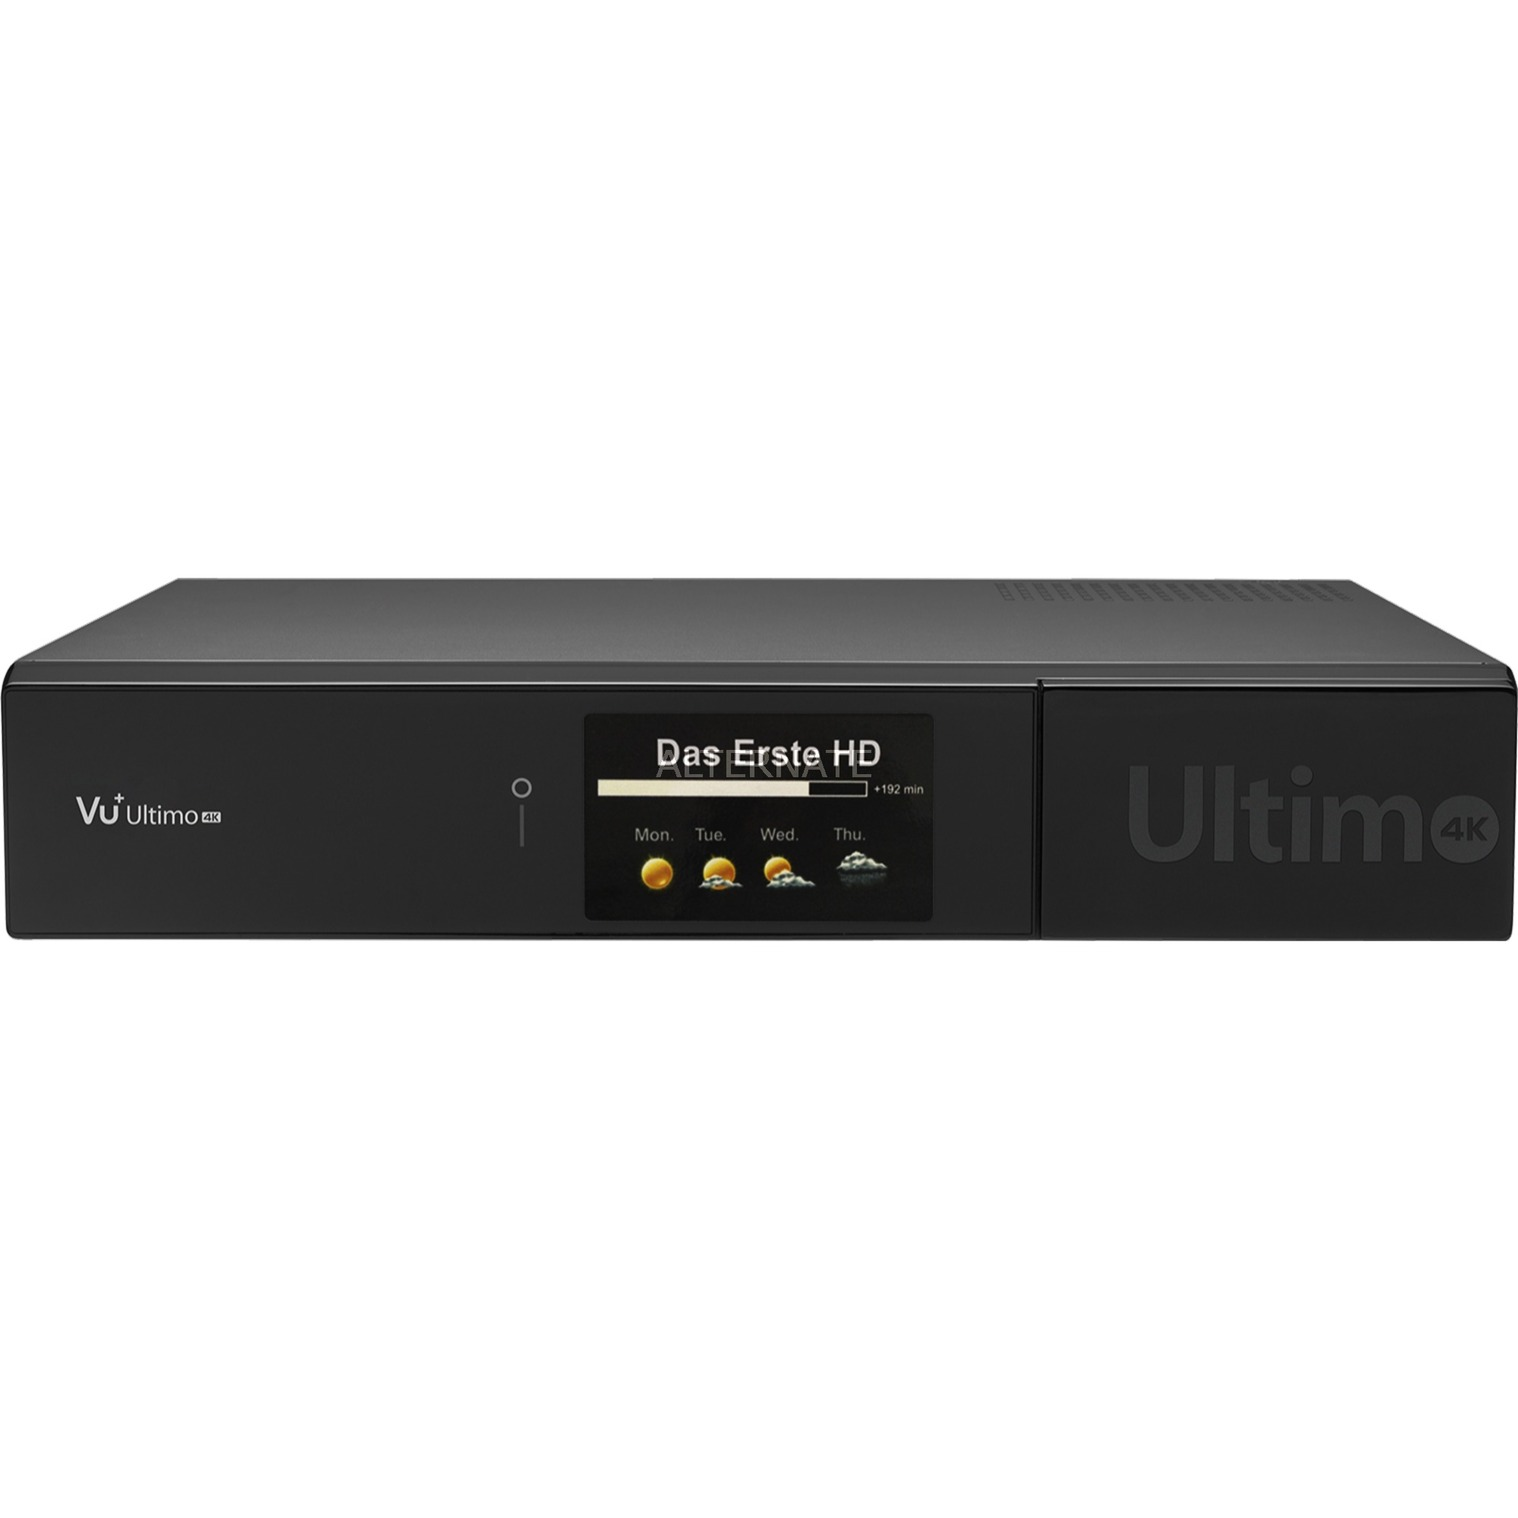 Ultimo 4K tV set-top boxes Satélite Alta Definición Total Negro, Receptor vía satélite/cable